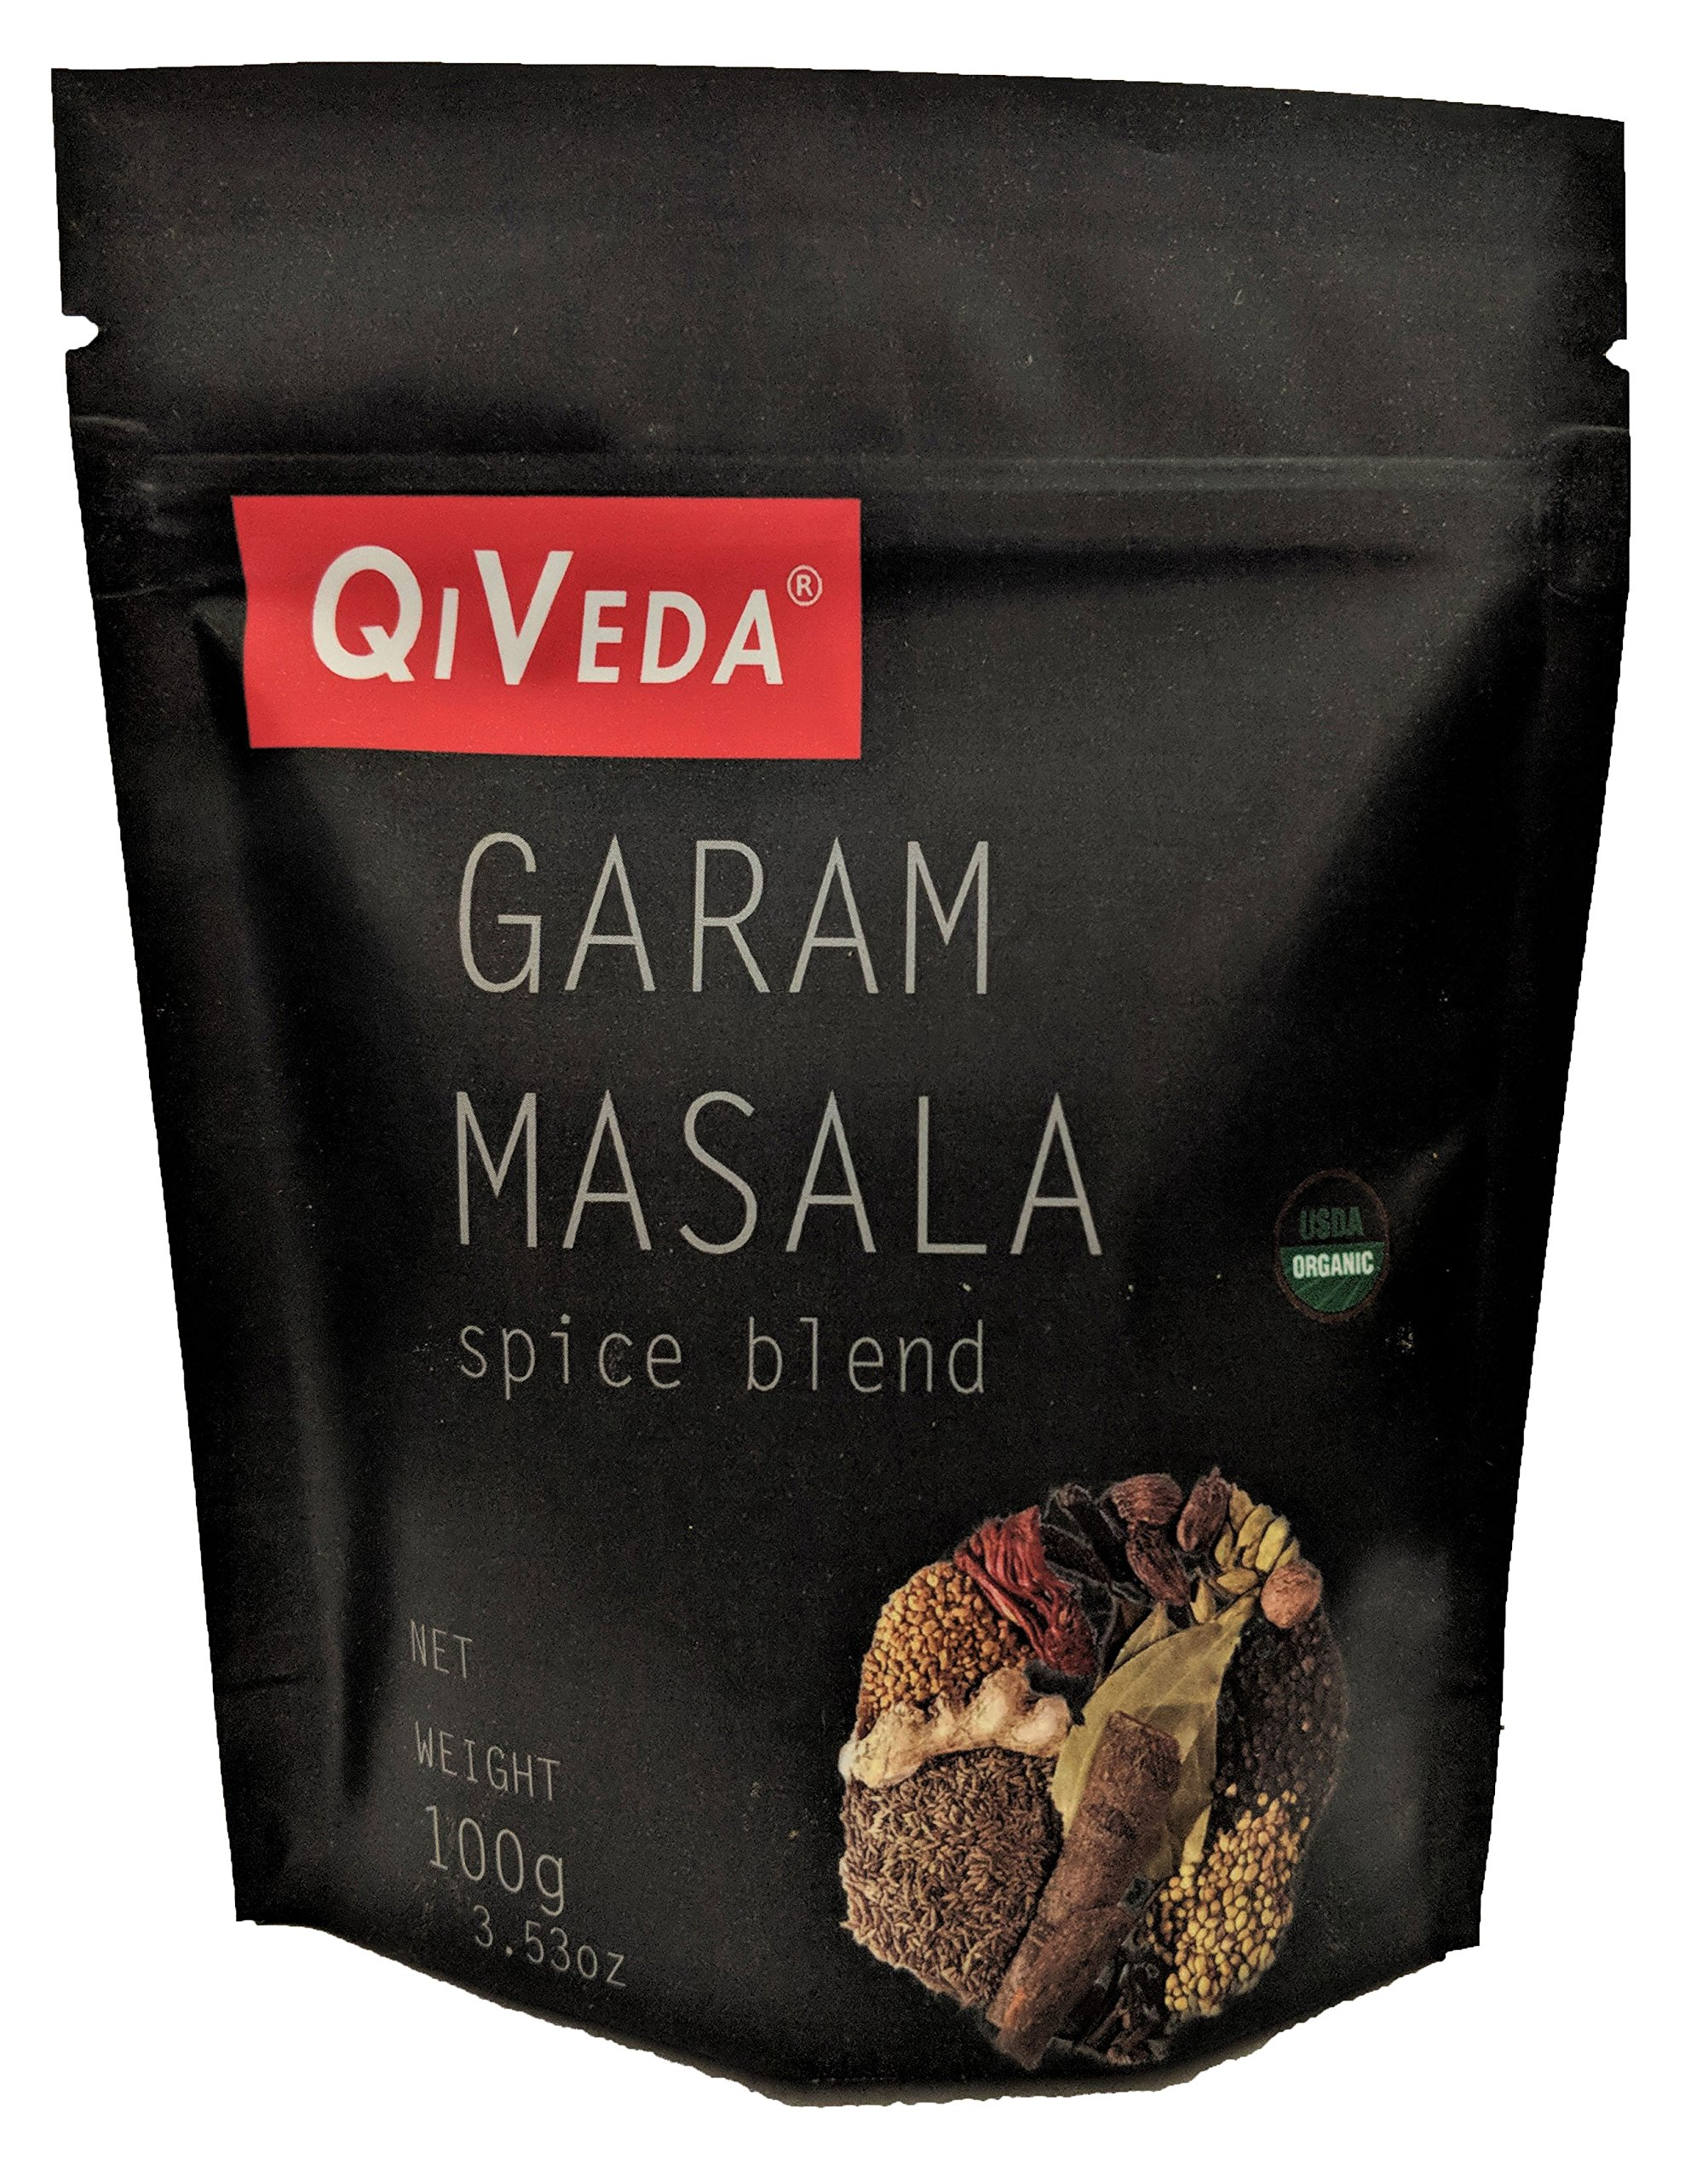 QiVeda USDA Organic Garam Masala 100 gram (3.53 oz) [Salt/Gluten Free]